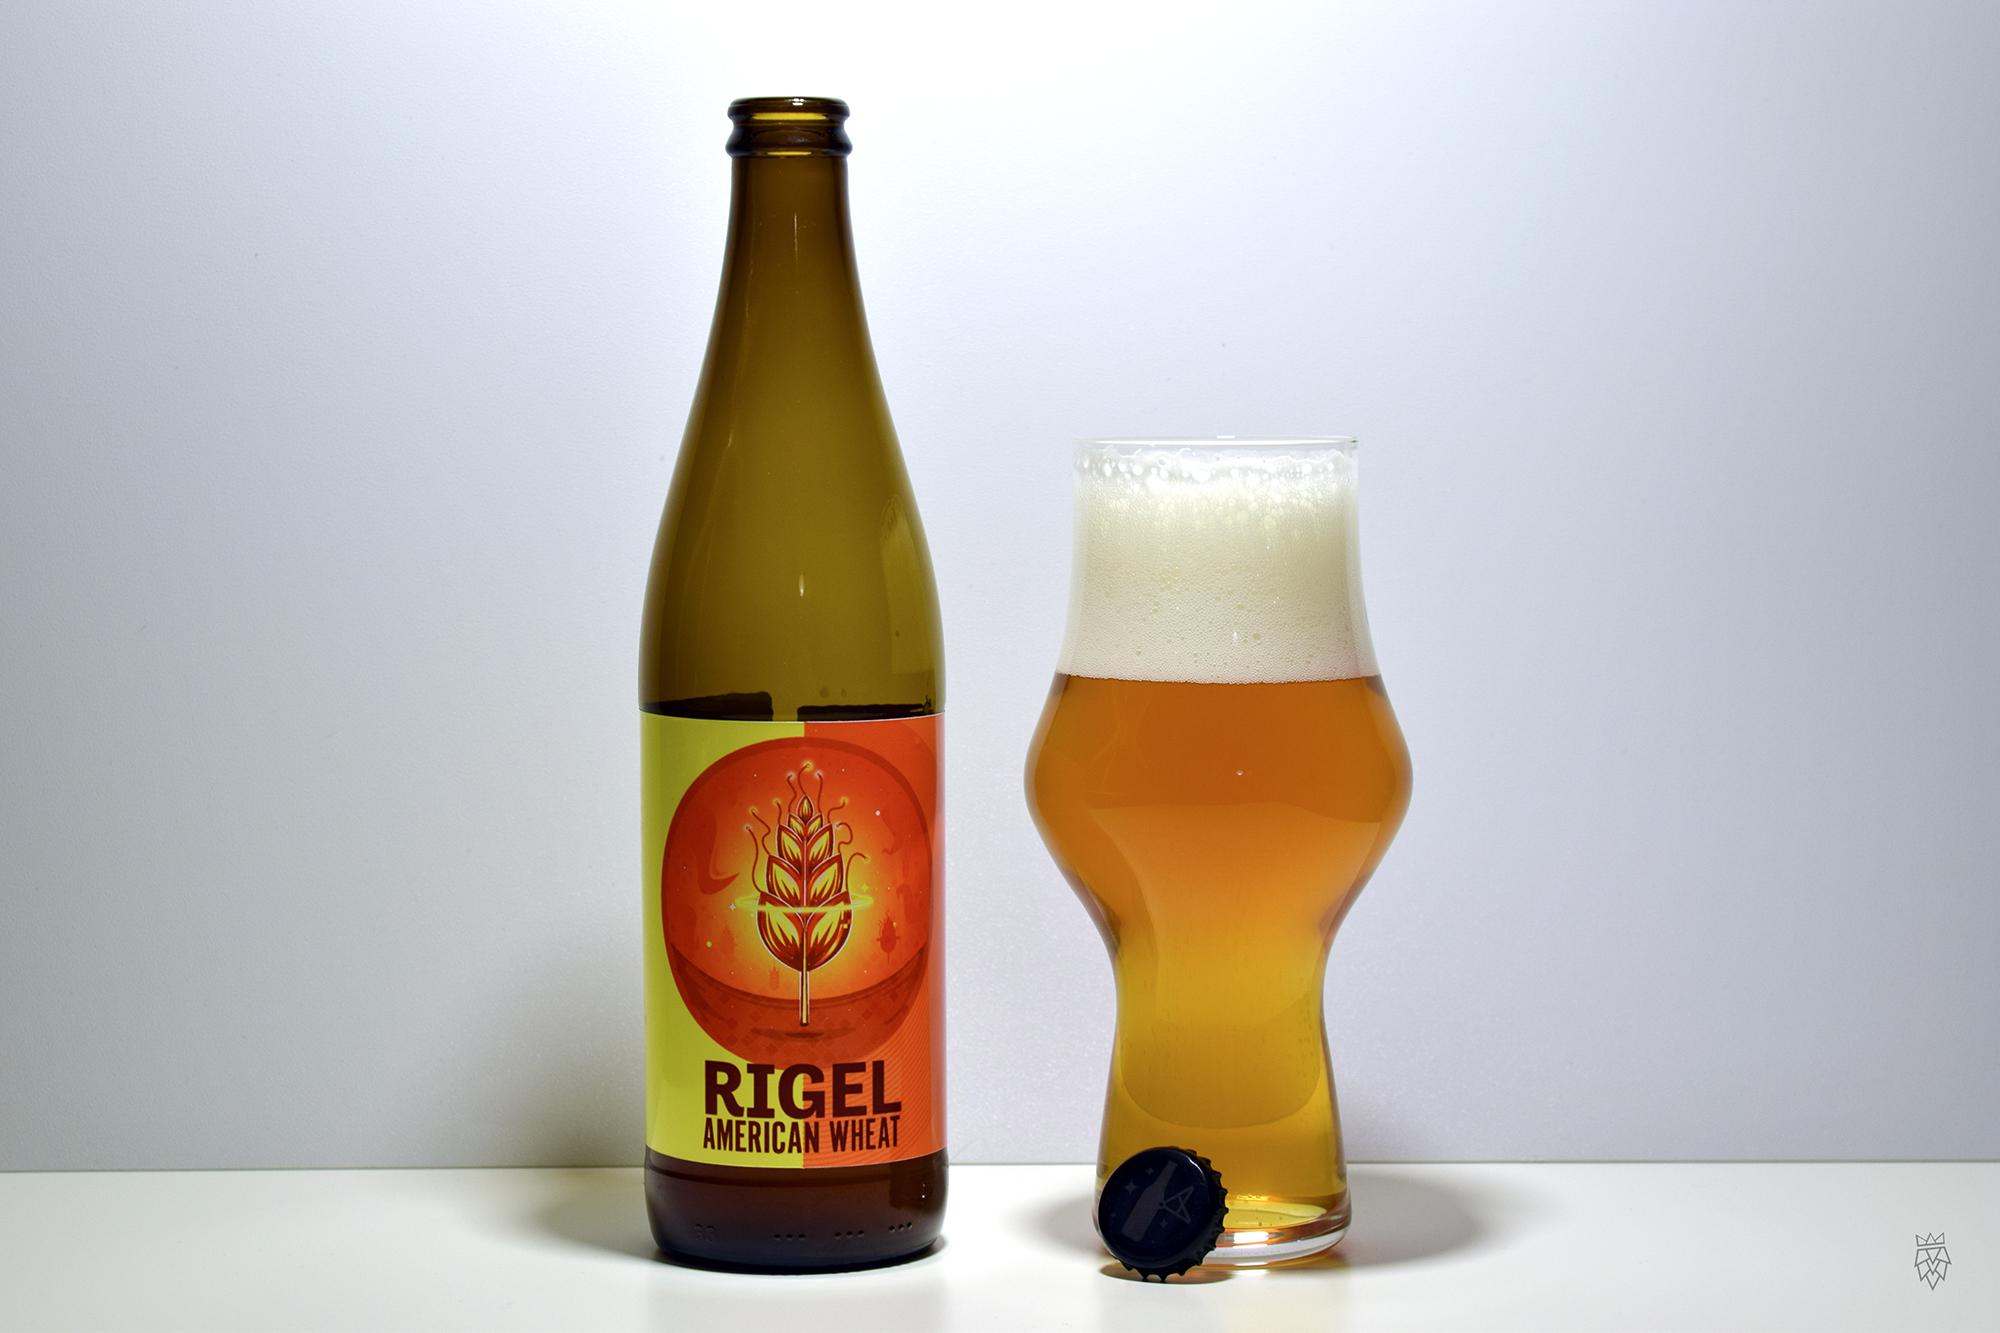 Mintaka - Rigel